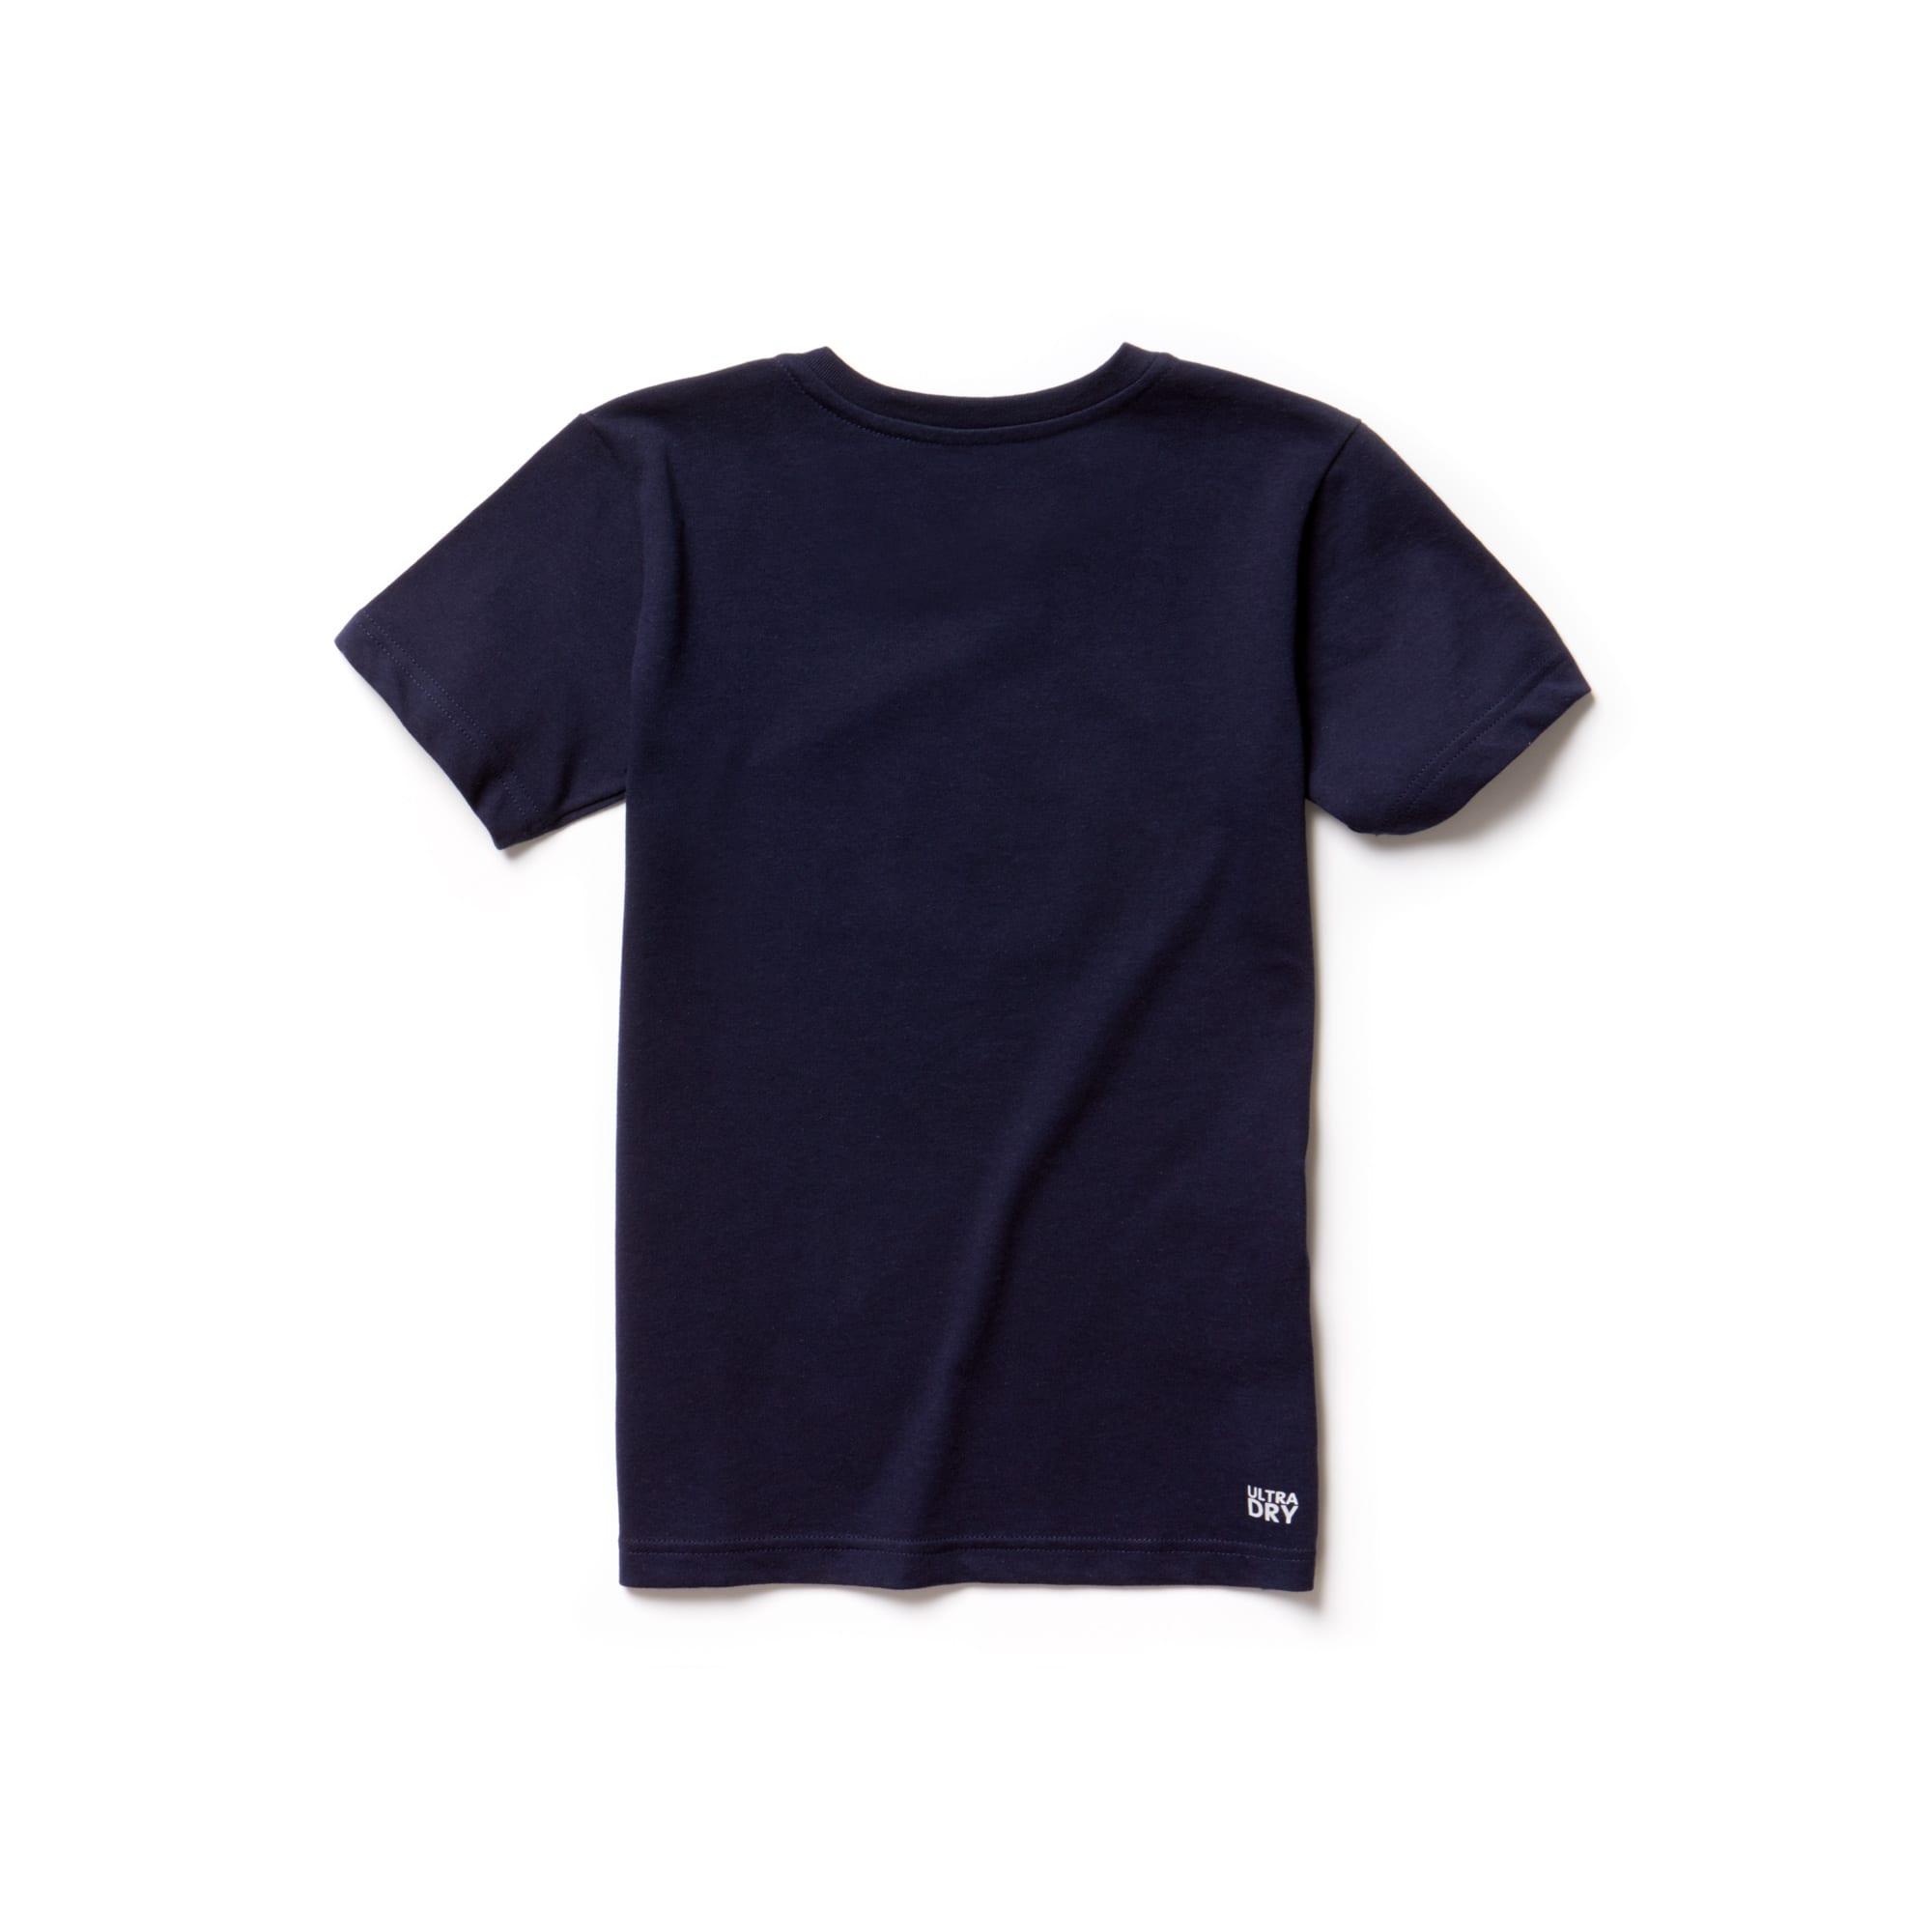 Lacoste - Camiseta infantil de tejido de punto técnico con gran cocodrilo Lacoste SPORT Tennis - 2